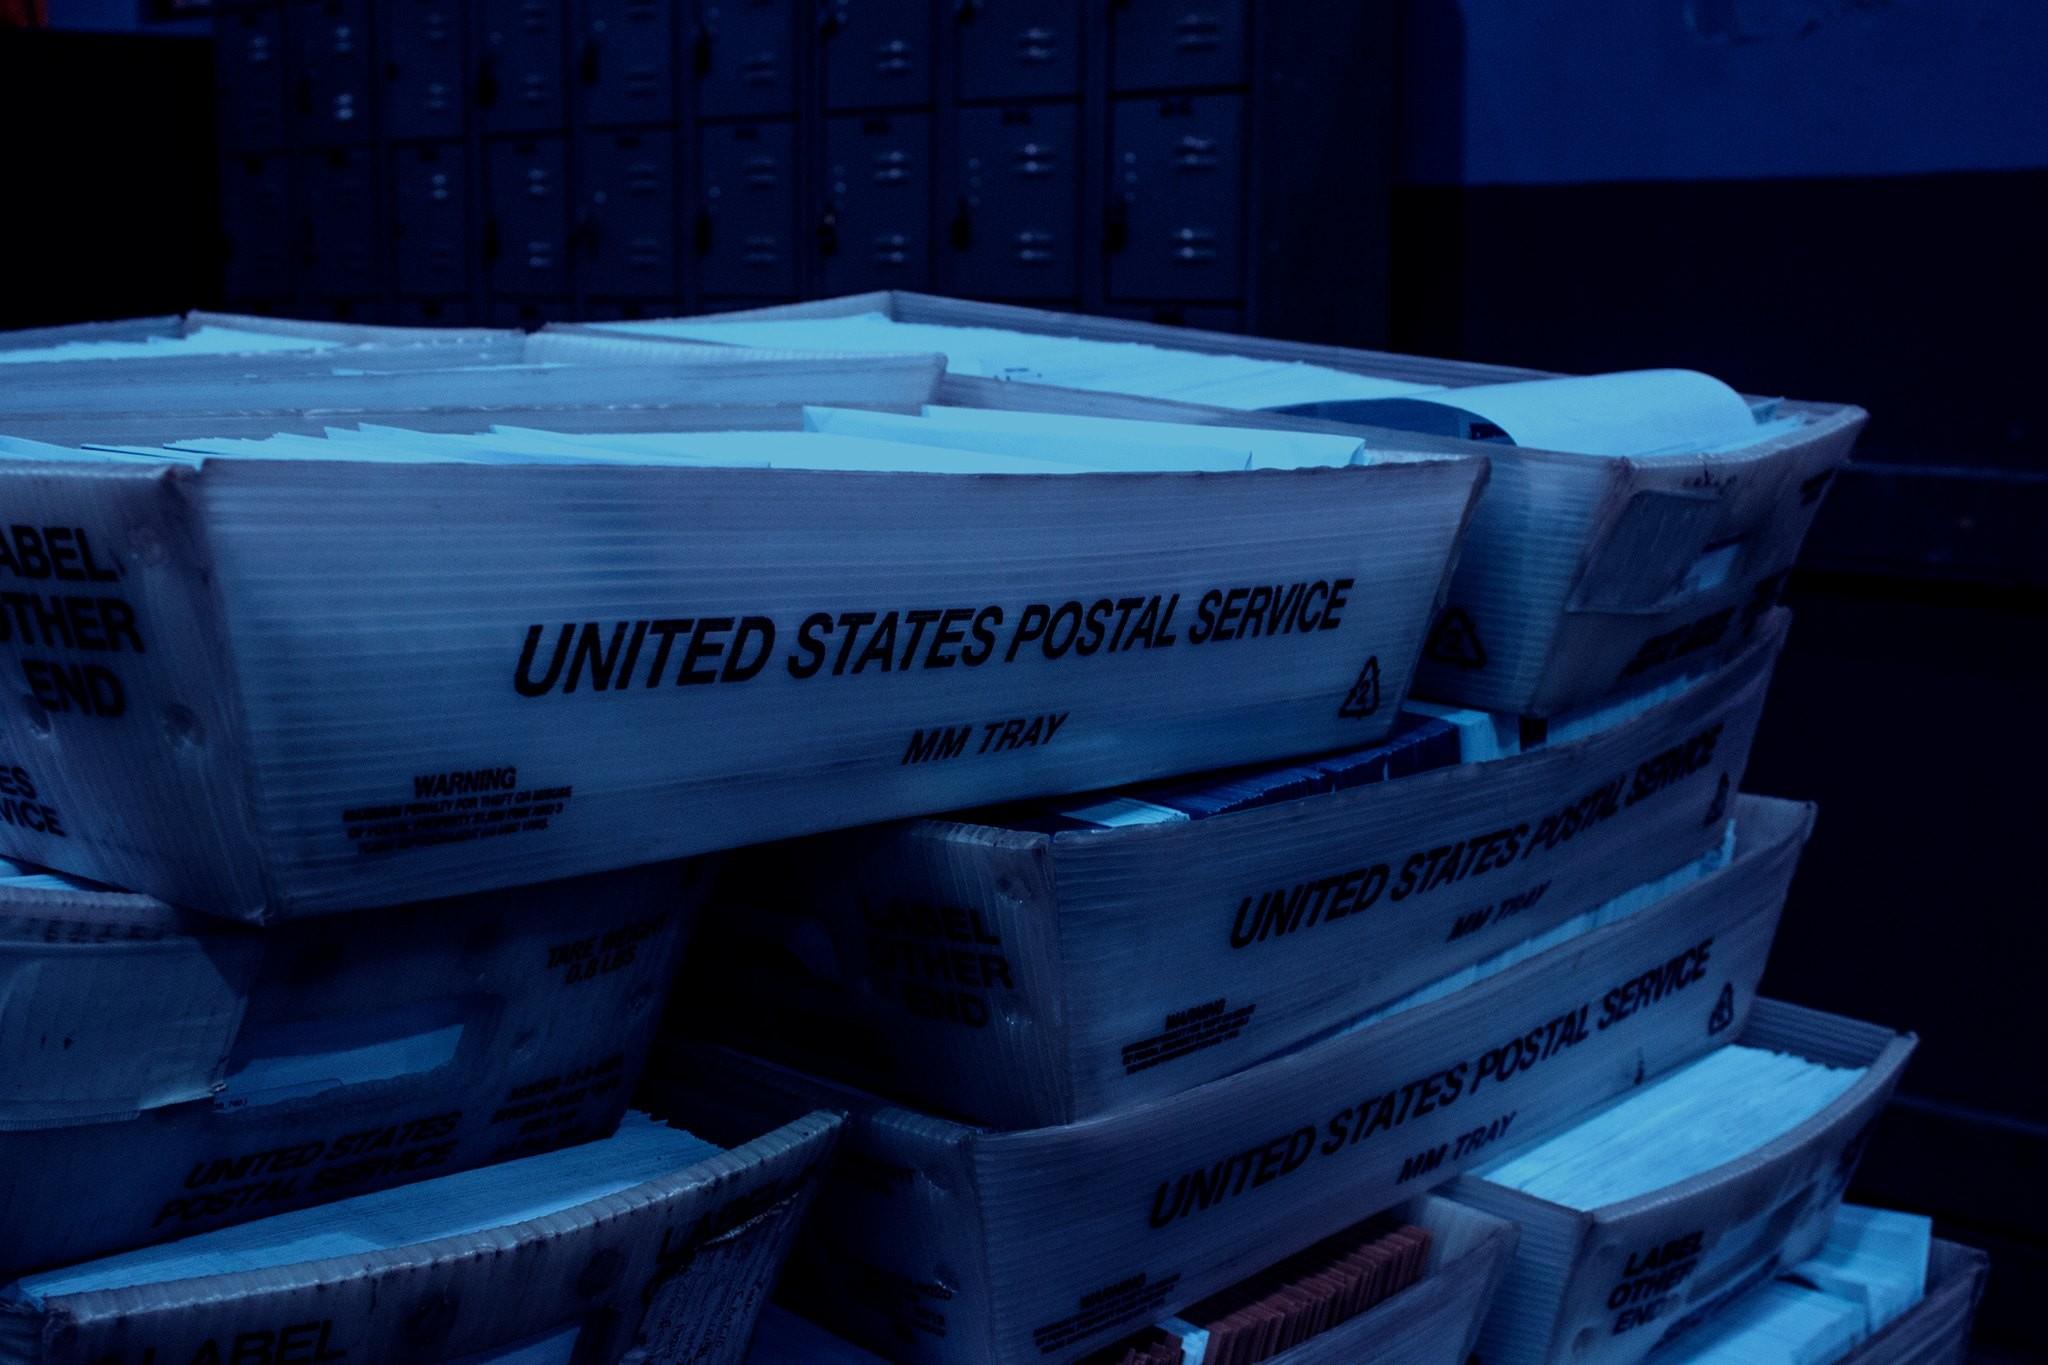 Postal Center International | LinkedIn